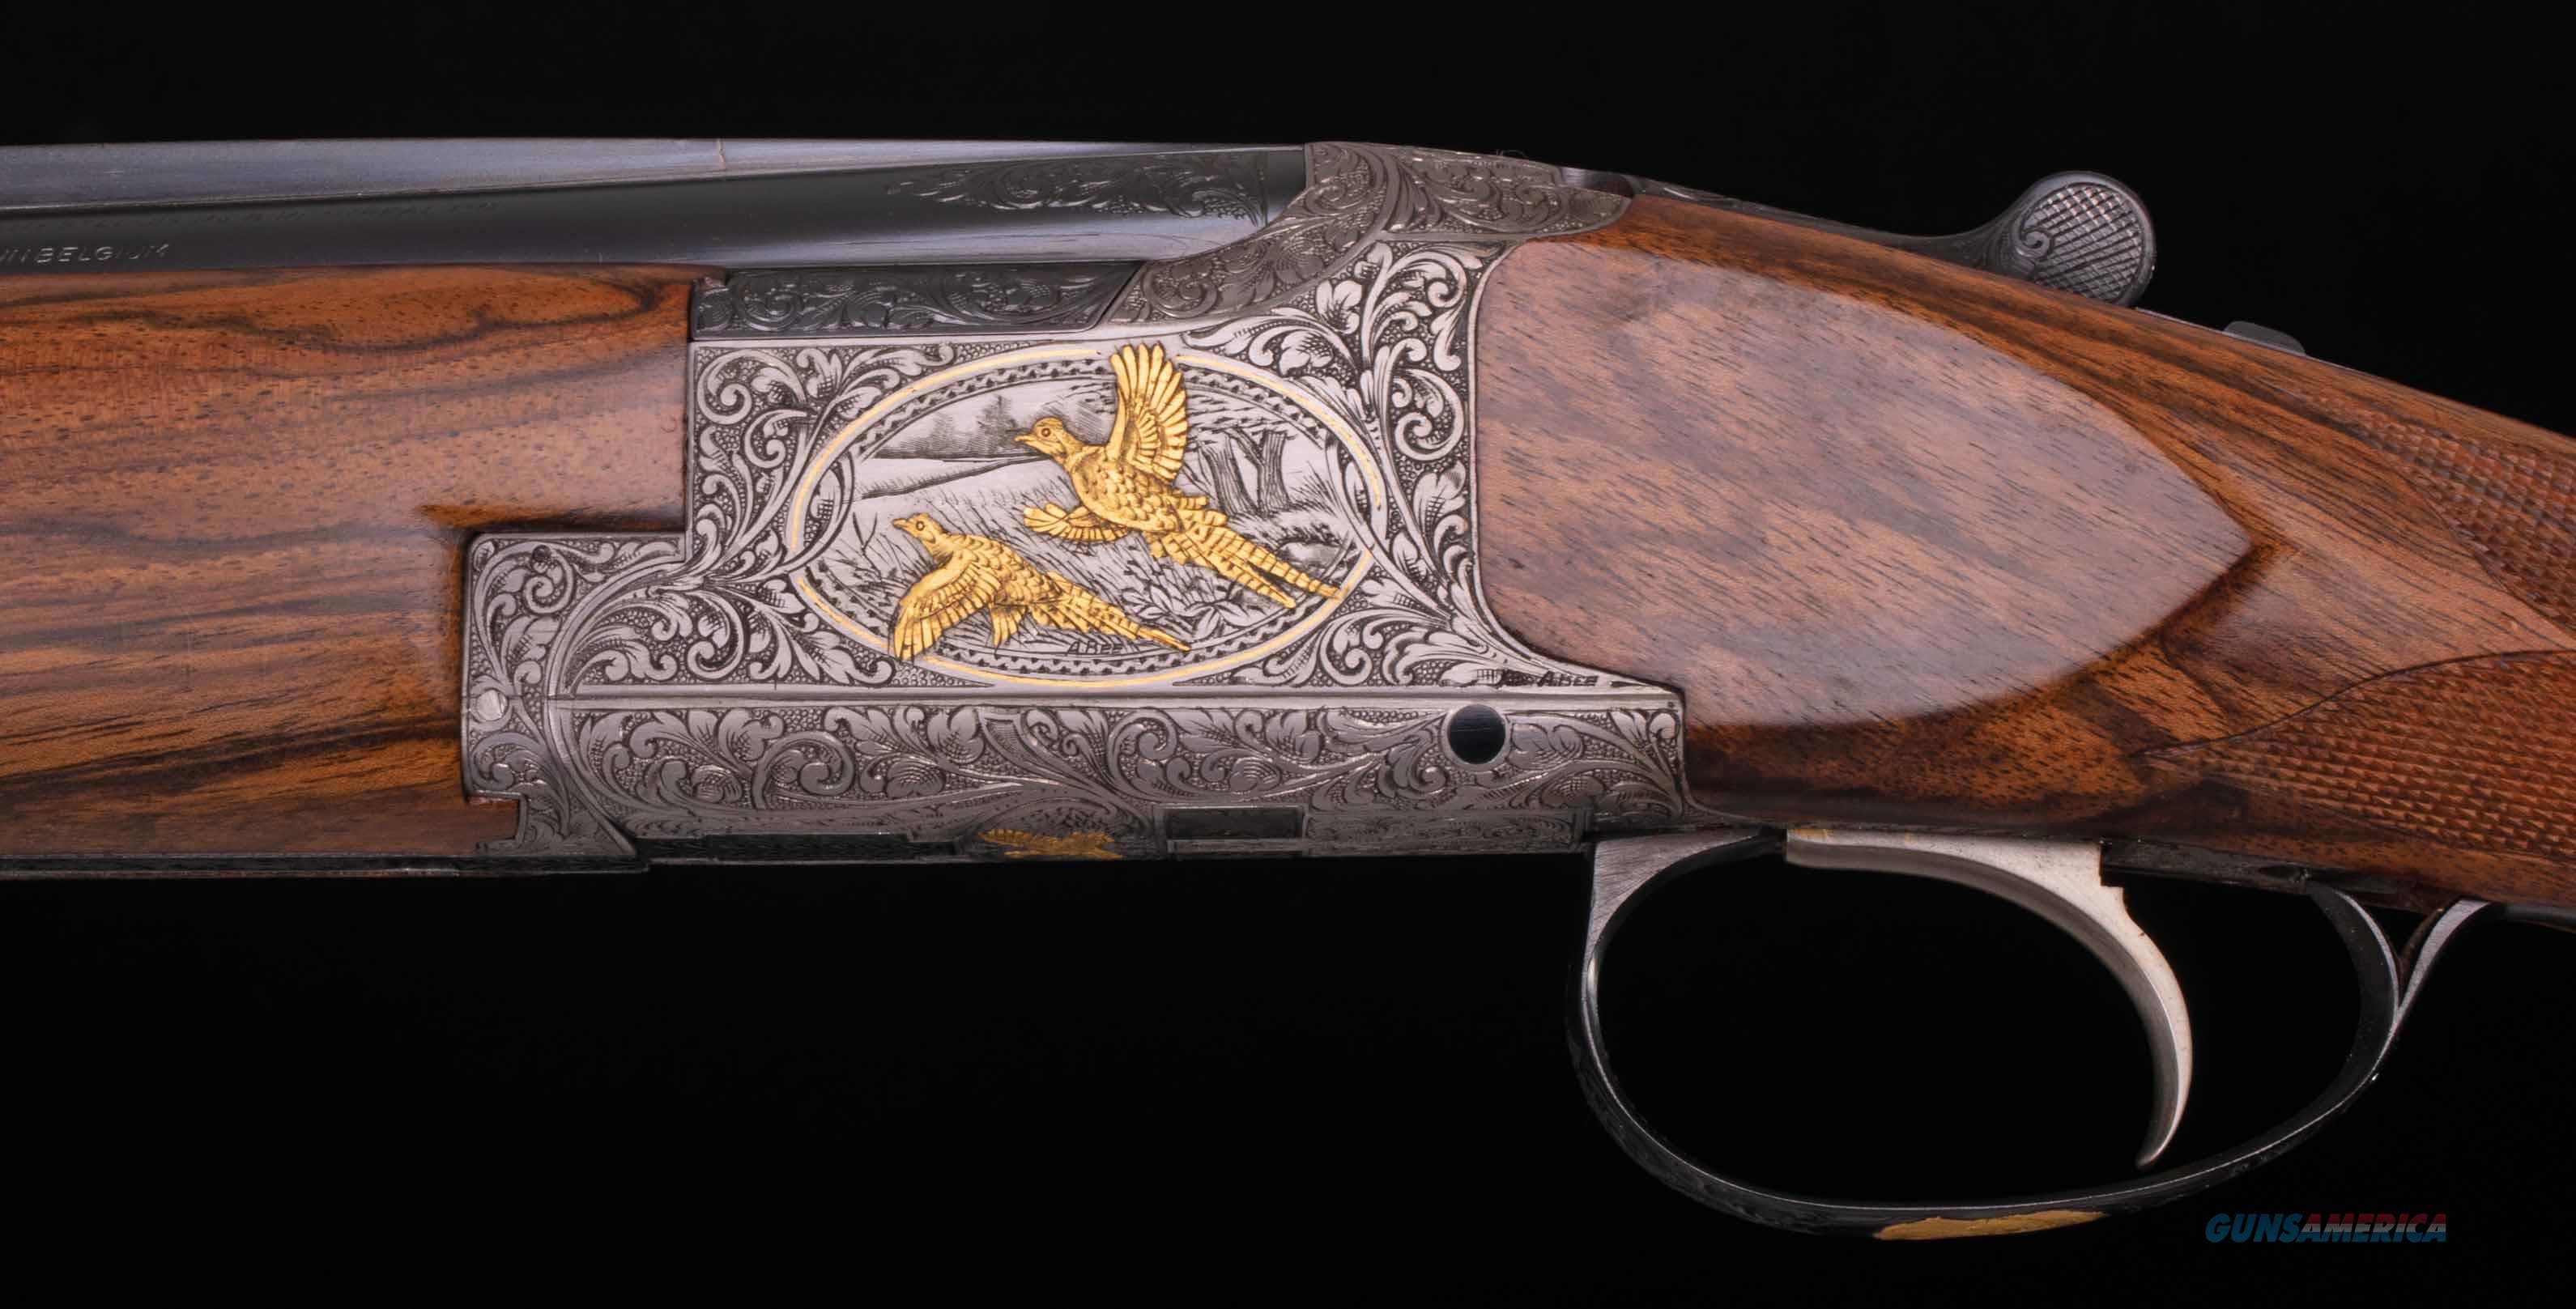 Browning Superposed 20 Gauge Shotgun – DIANA GRADE W/ GOLD, ANGELO BEE, vintage firearms inc  Guns > Shotguns > Browning Shotguns > Over Unders > Belgian Manufacture